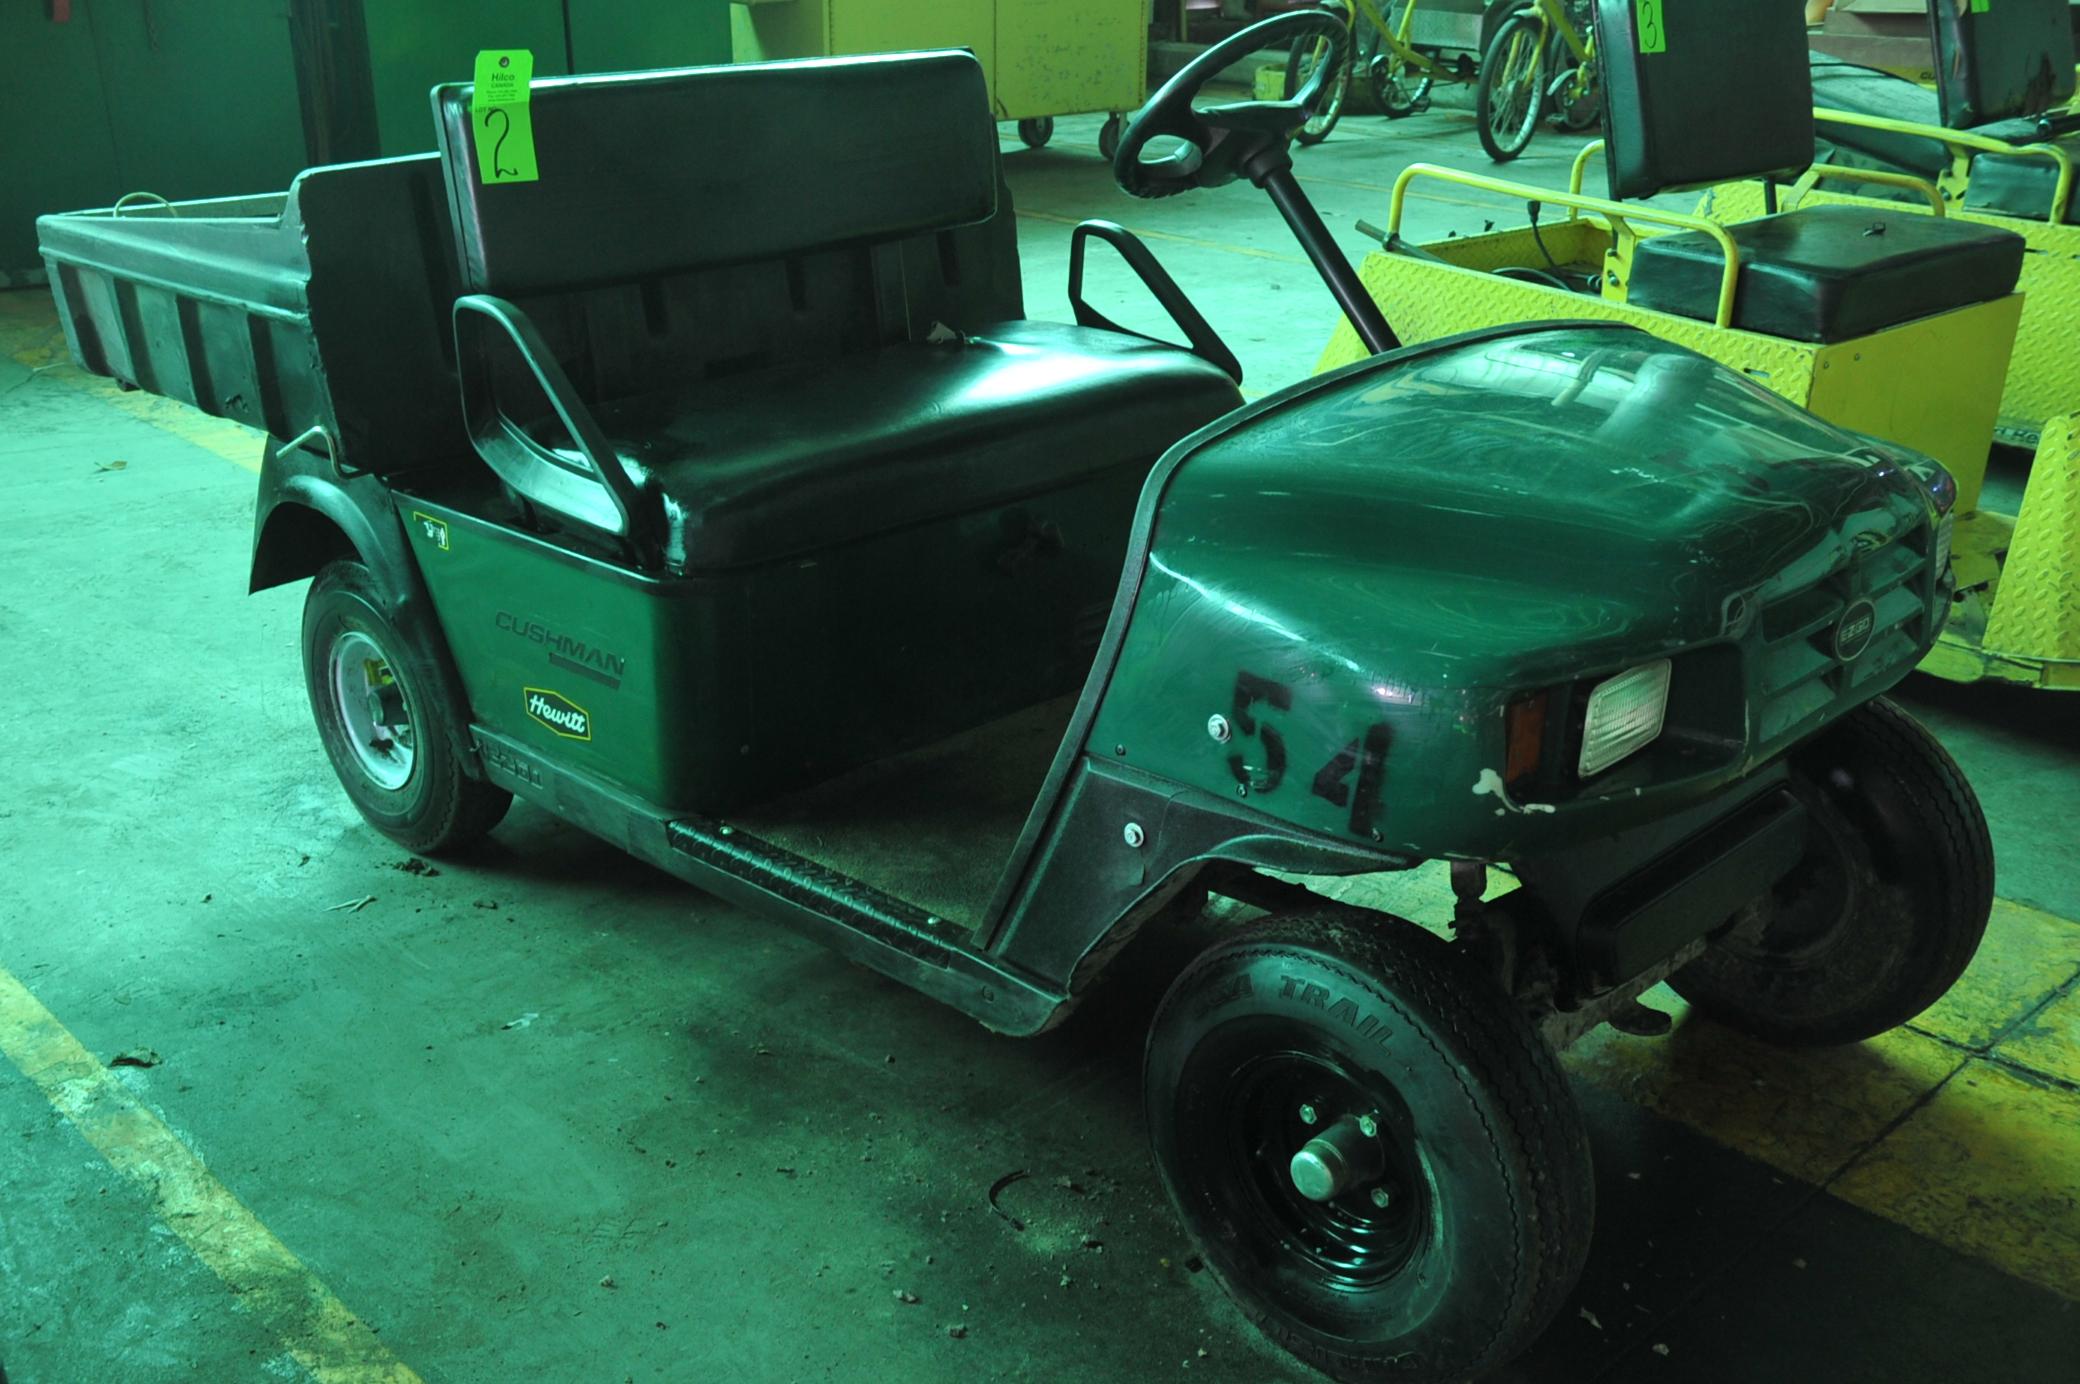 Lot 2 - Cushman Model Commander Electric Powered Cart